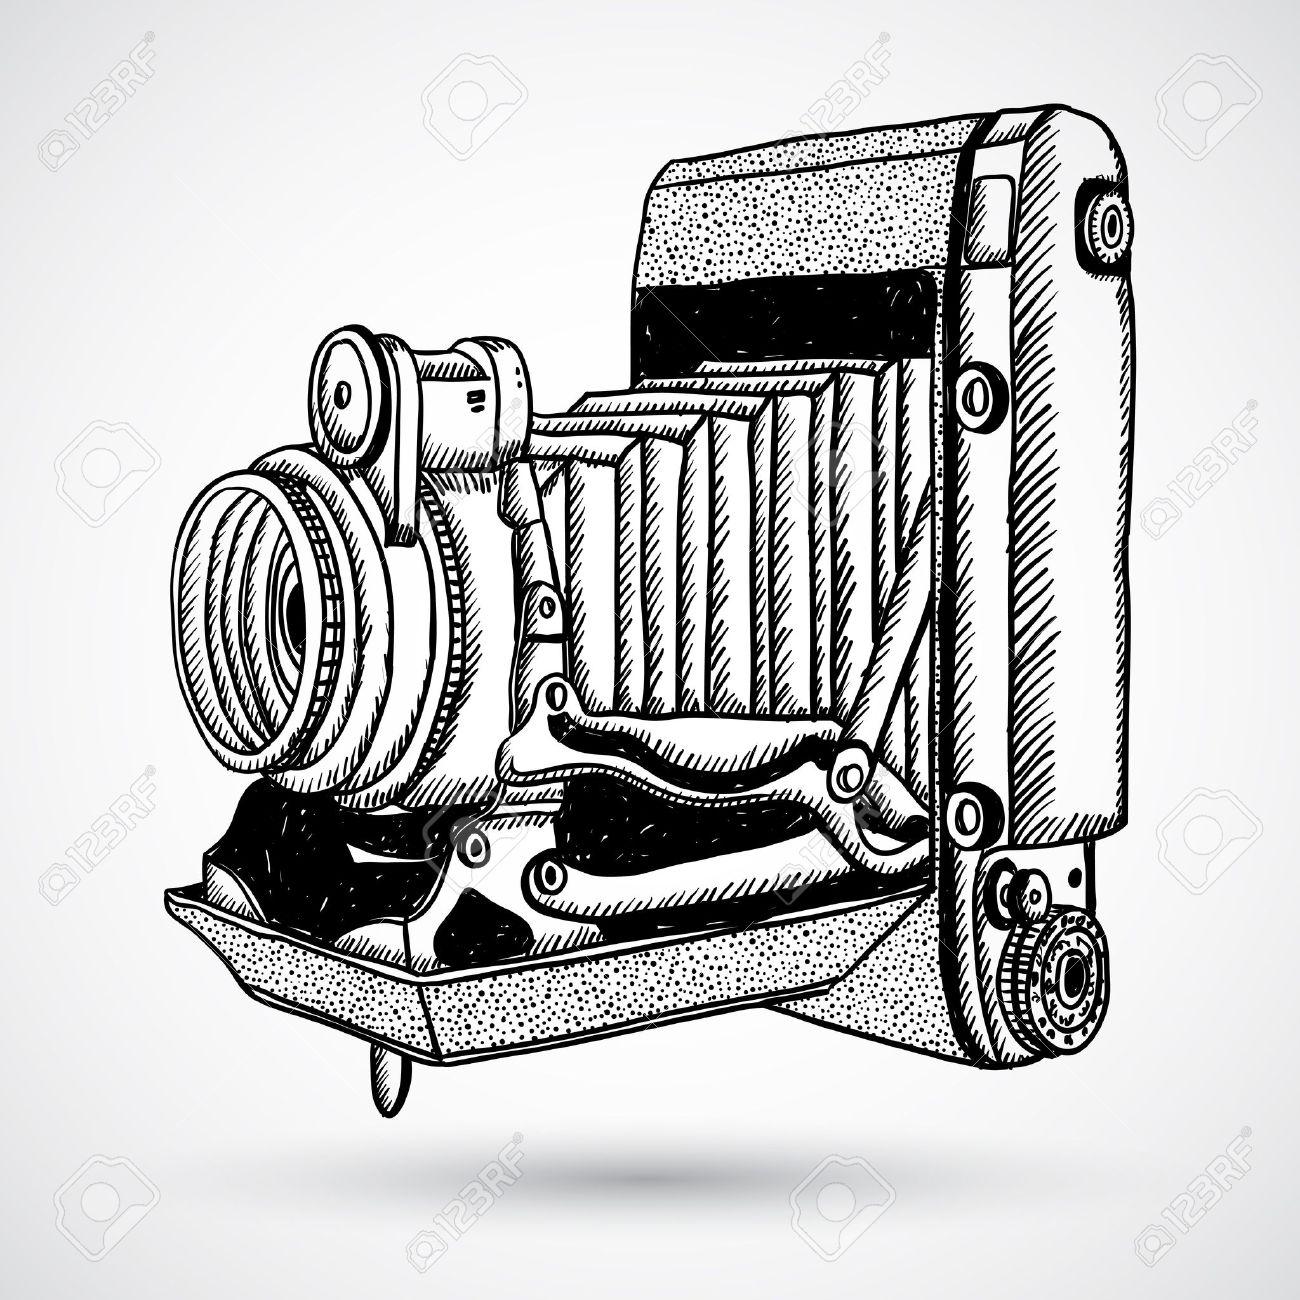 1300x1300 Vintage Doodle Camera, Hand Drawn Royalty Free Cliparts, Vectors